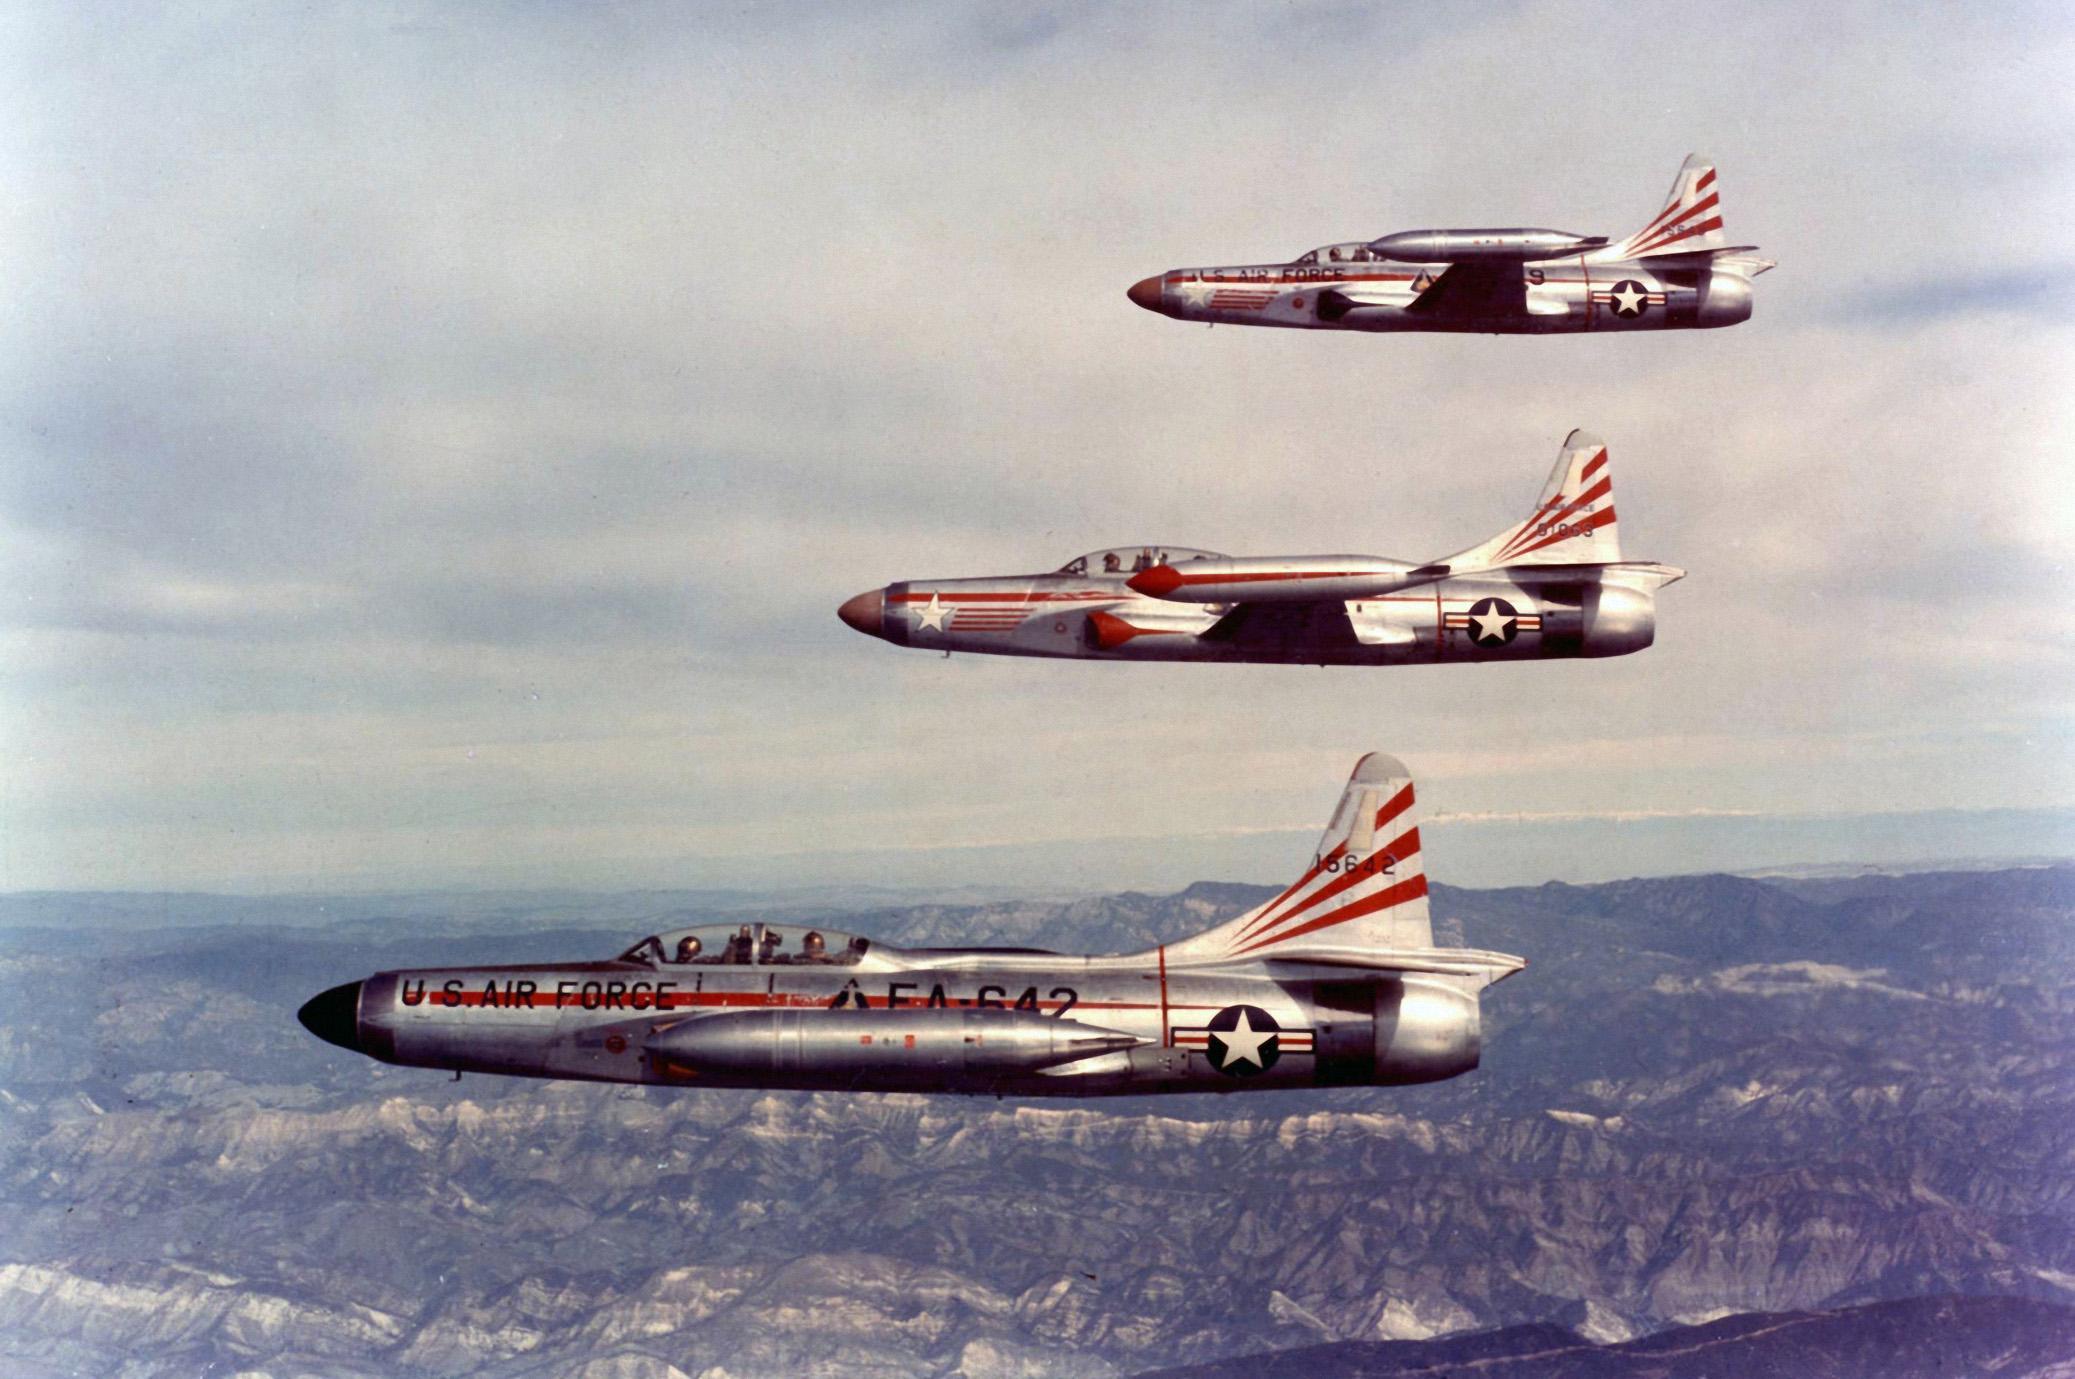 The F-94 Starfire